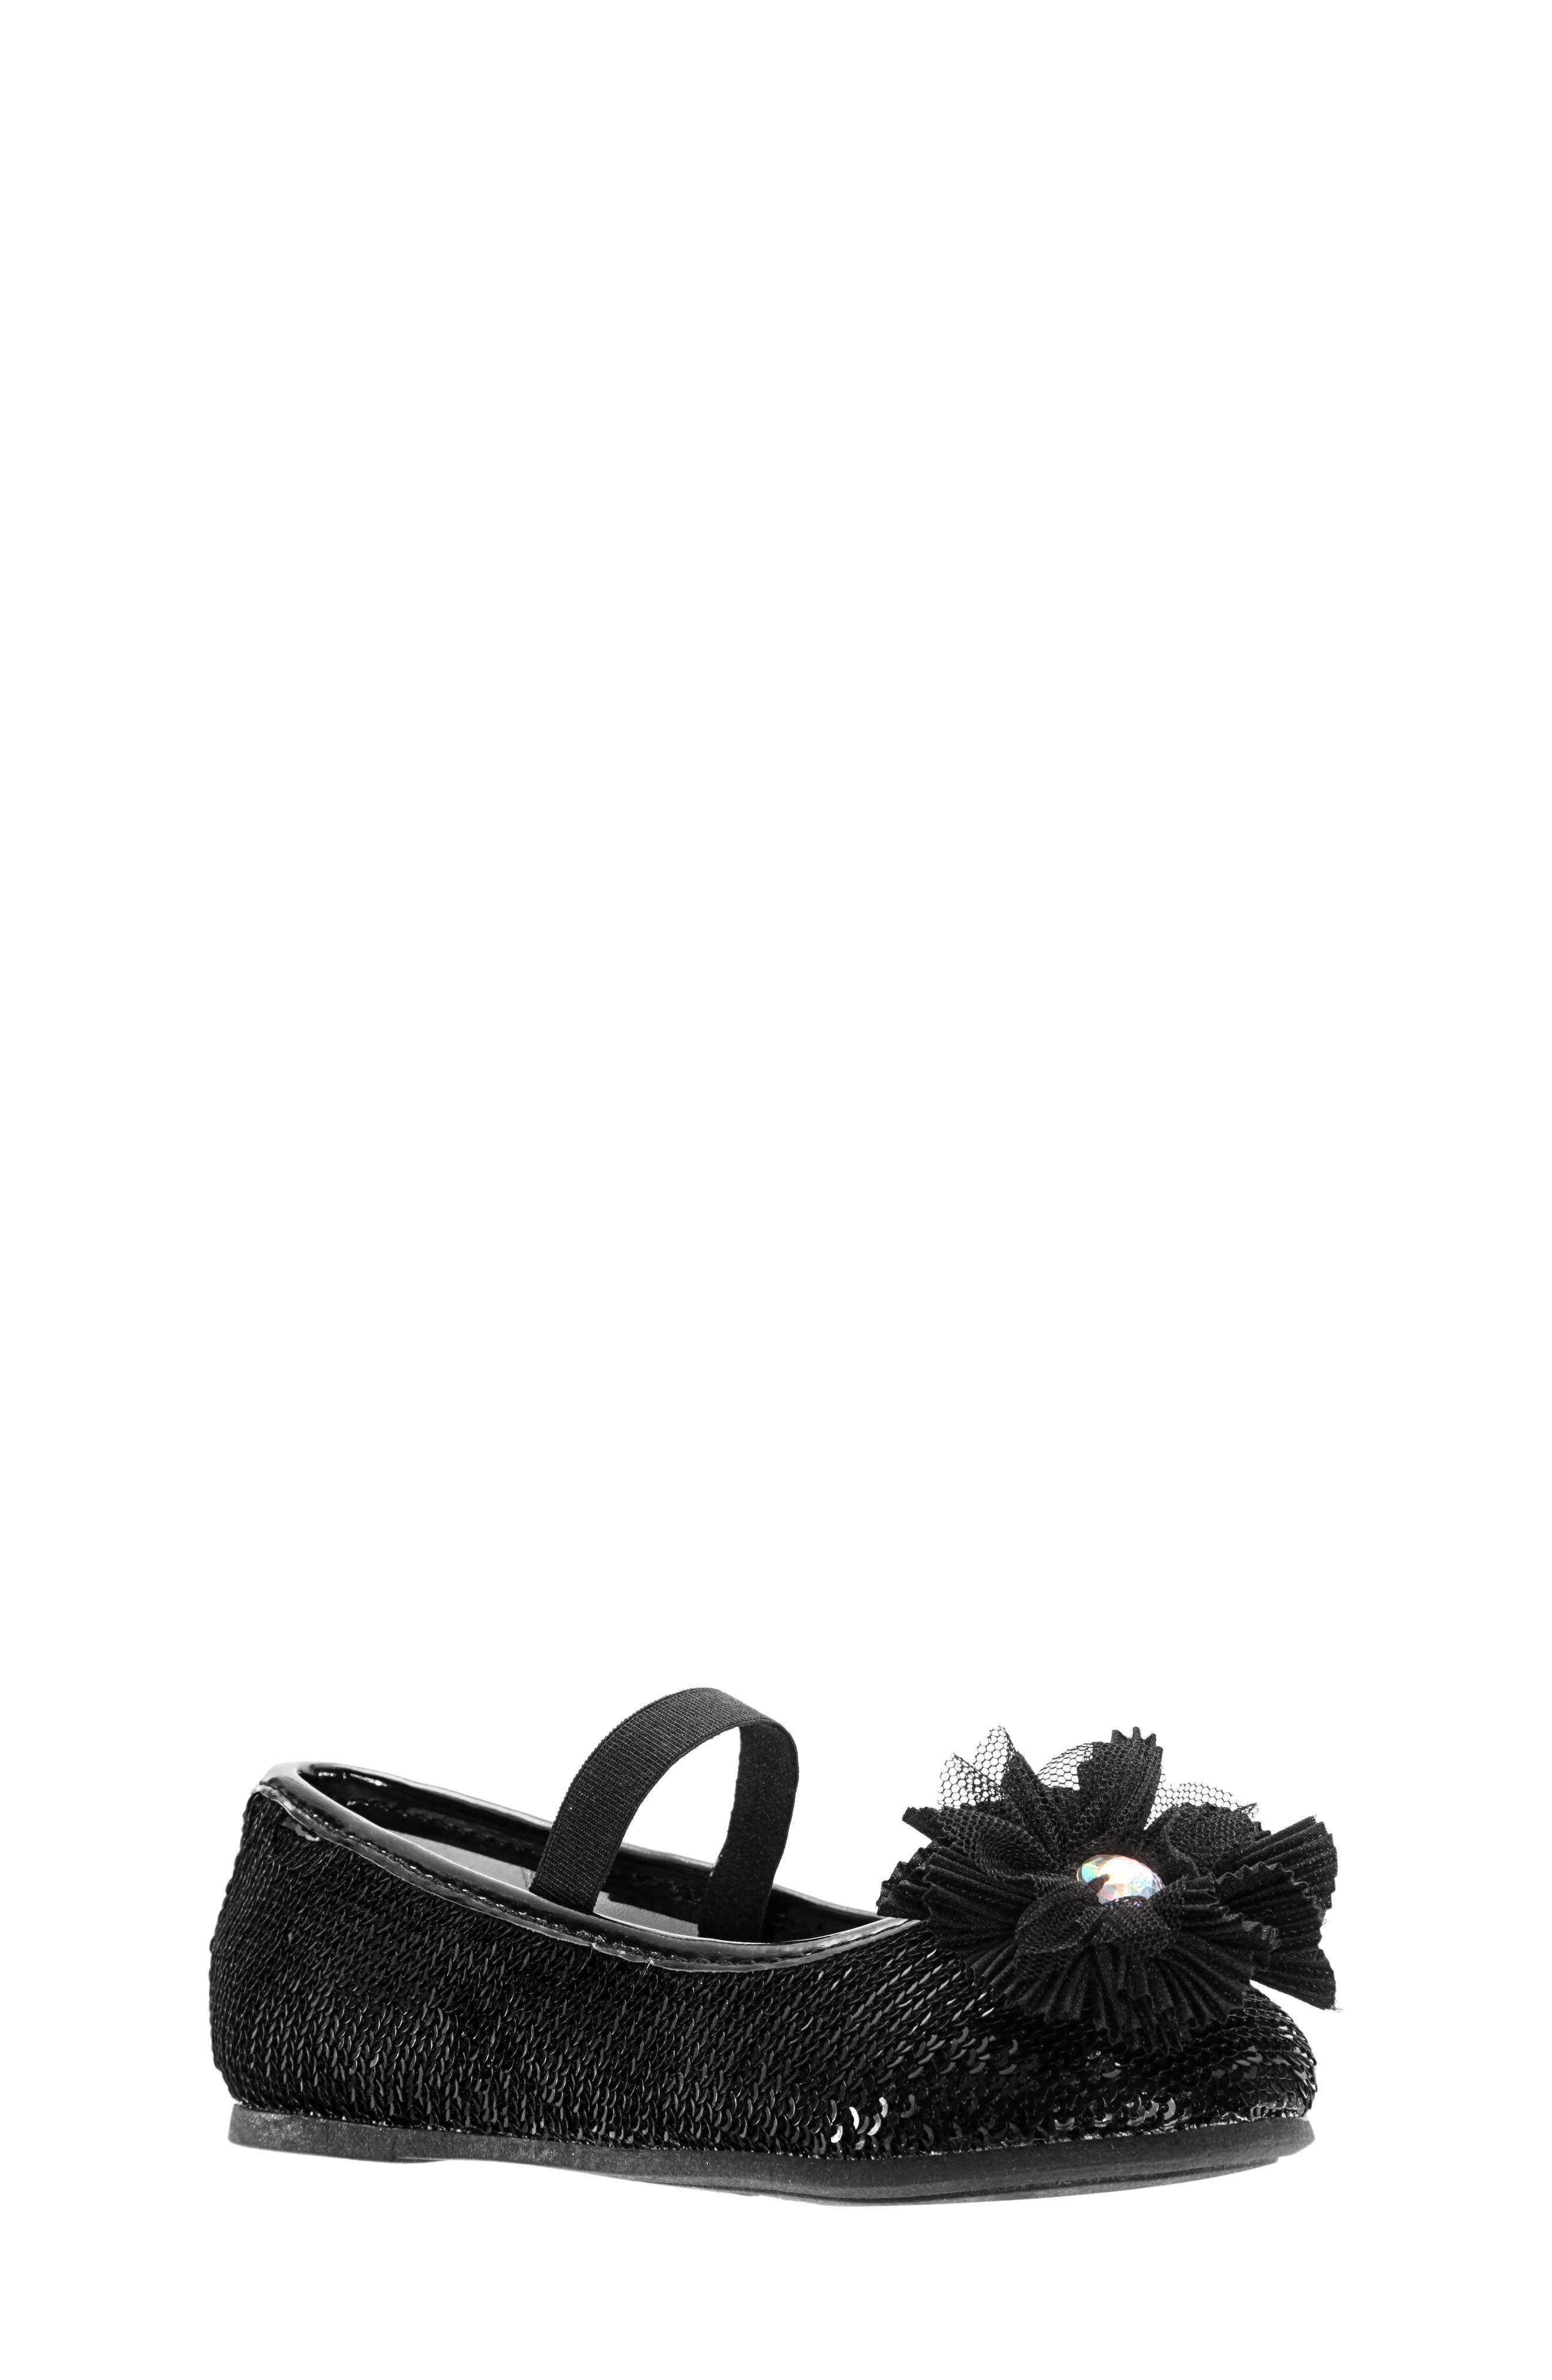 Sequin Ballet Flat,                         Main,                         color, BLACK SEQUINS